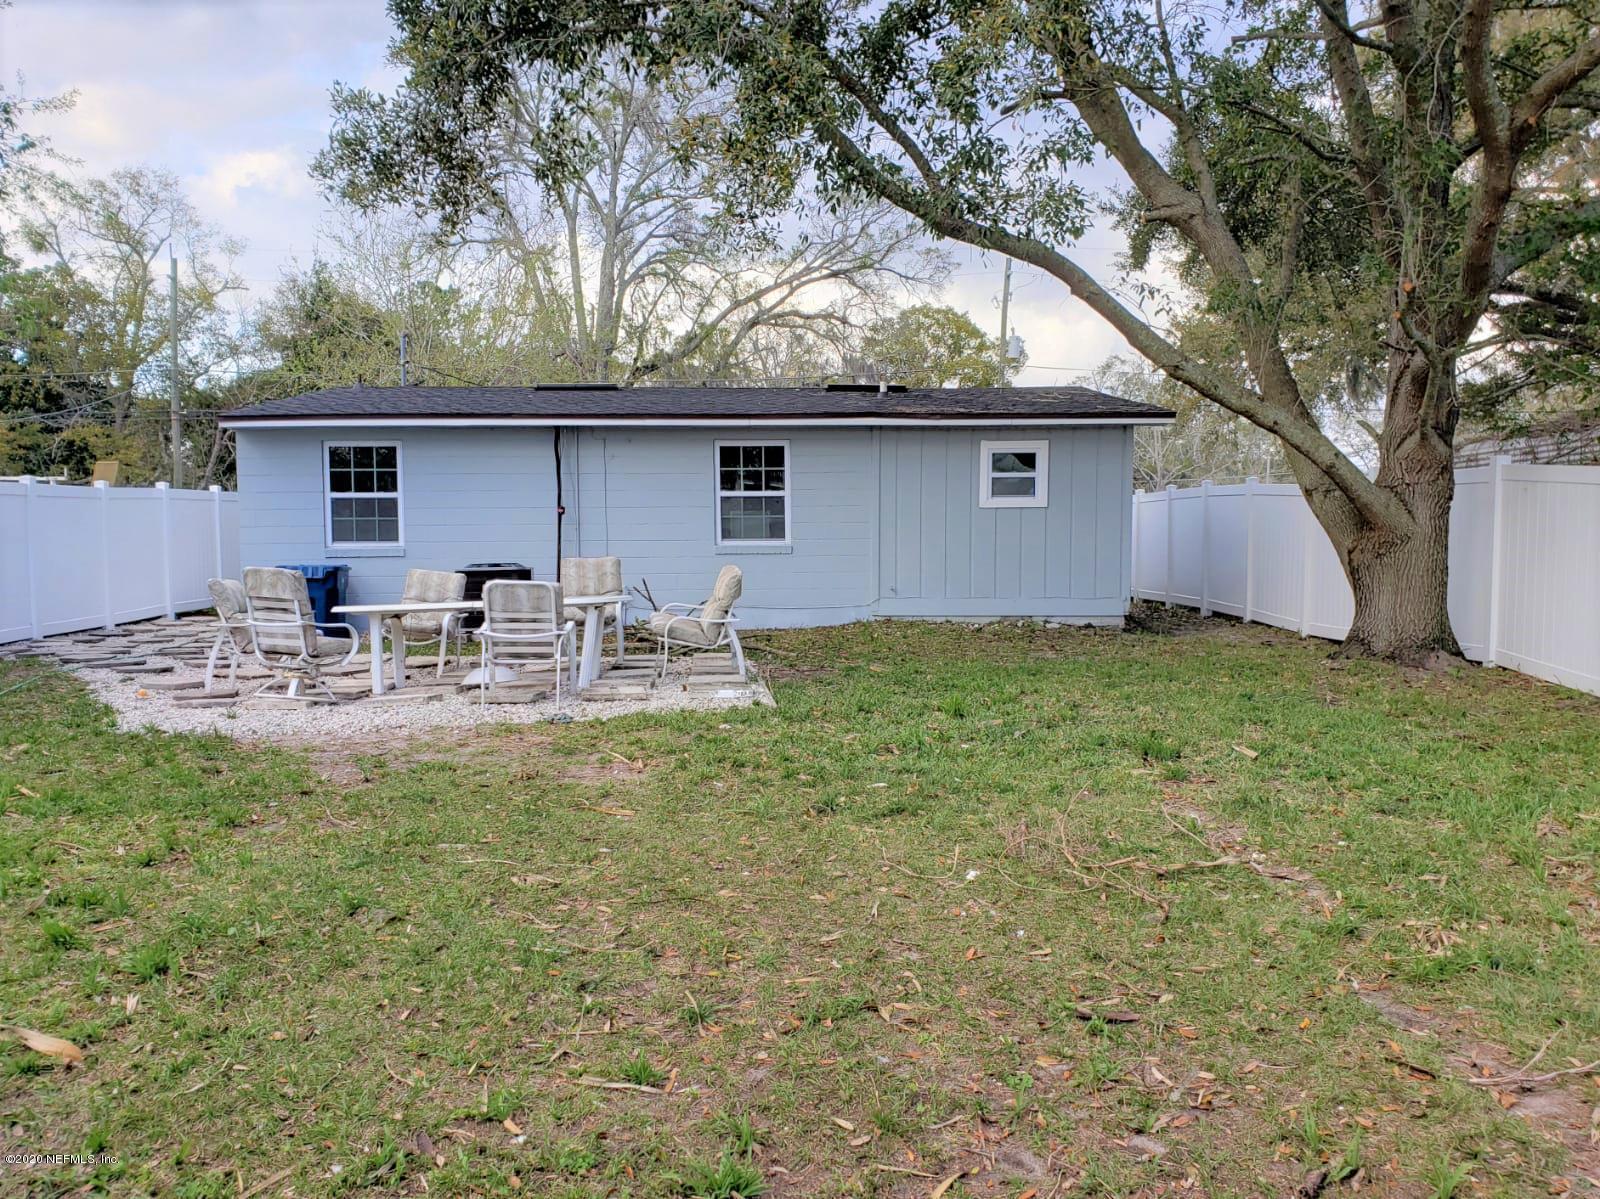 7724 BERRY, JACKSONVILLE, FLORIDA 32211, 2 Bedrooms Bedrooms, ,2 BathroomsBathrooms,Residential,For sale,BERRY,1038143